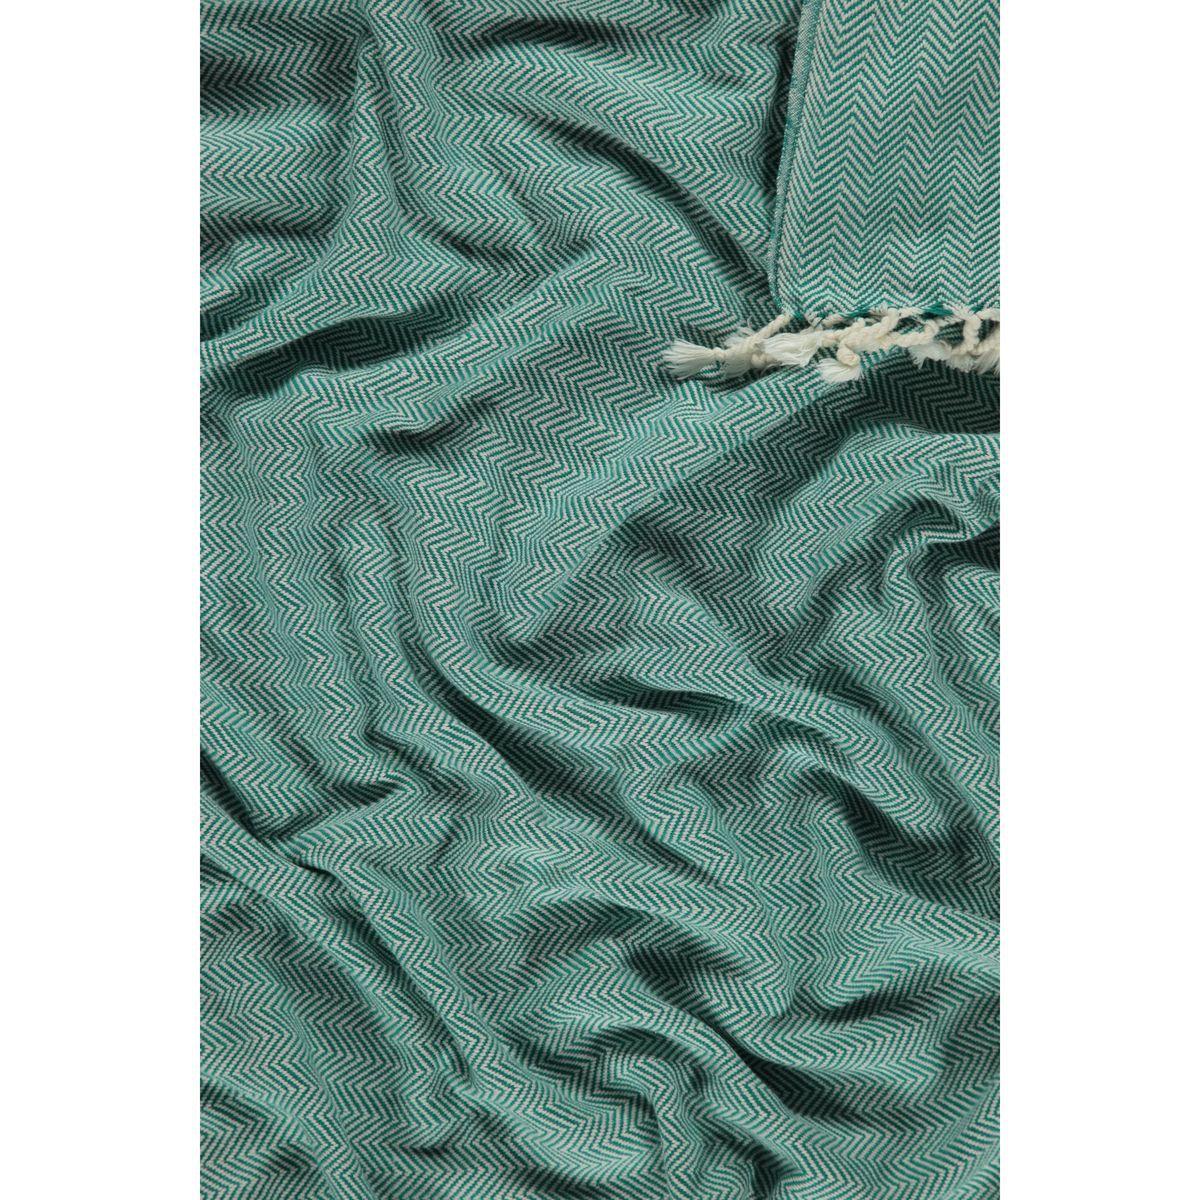 Peshtemal Zigzag - Fanfare Green